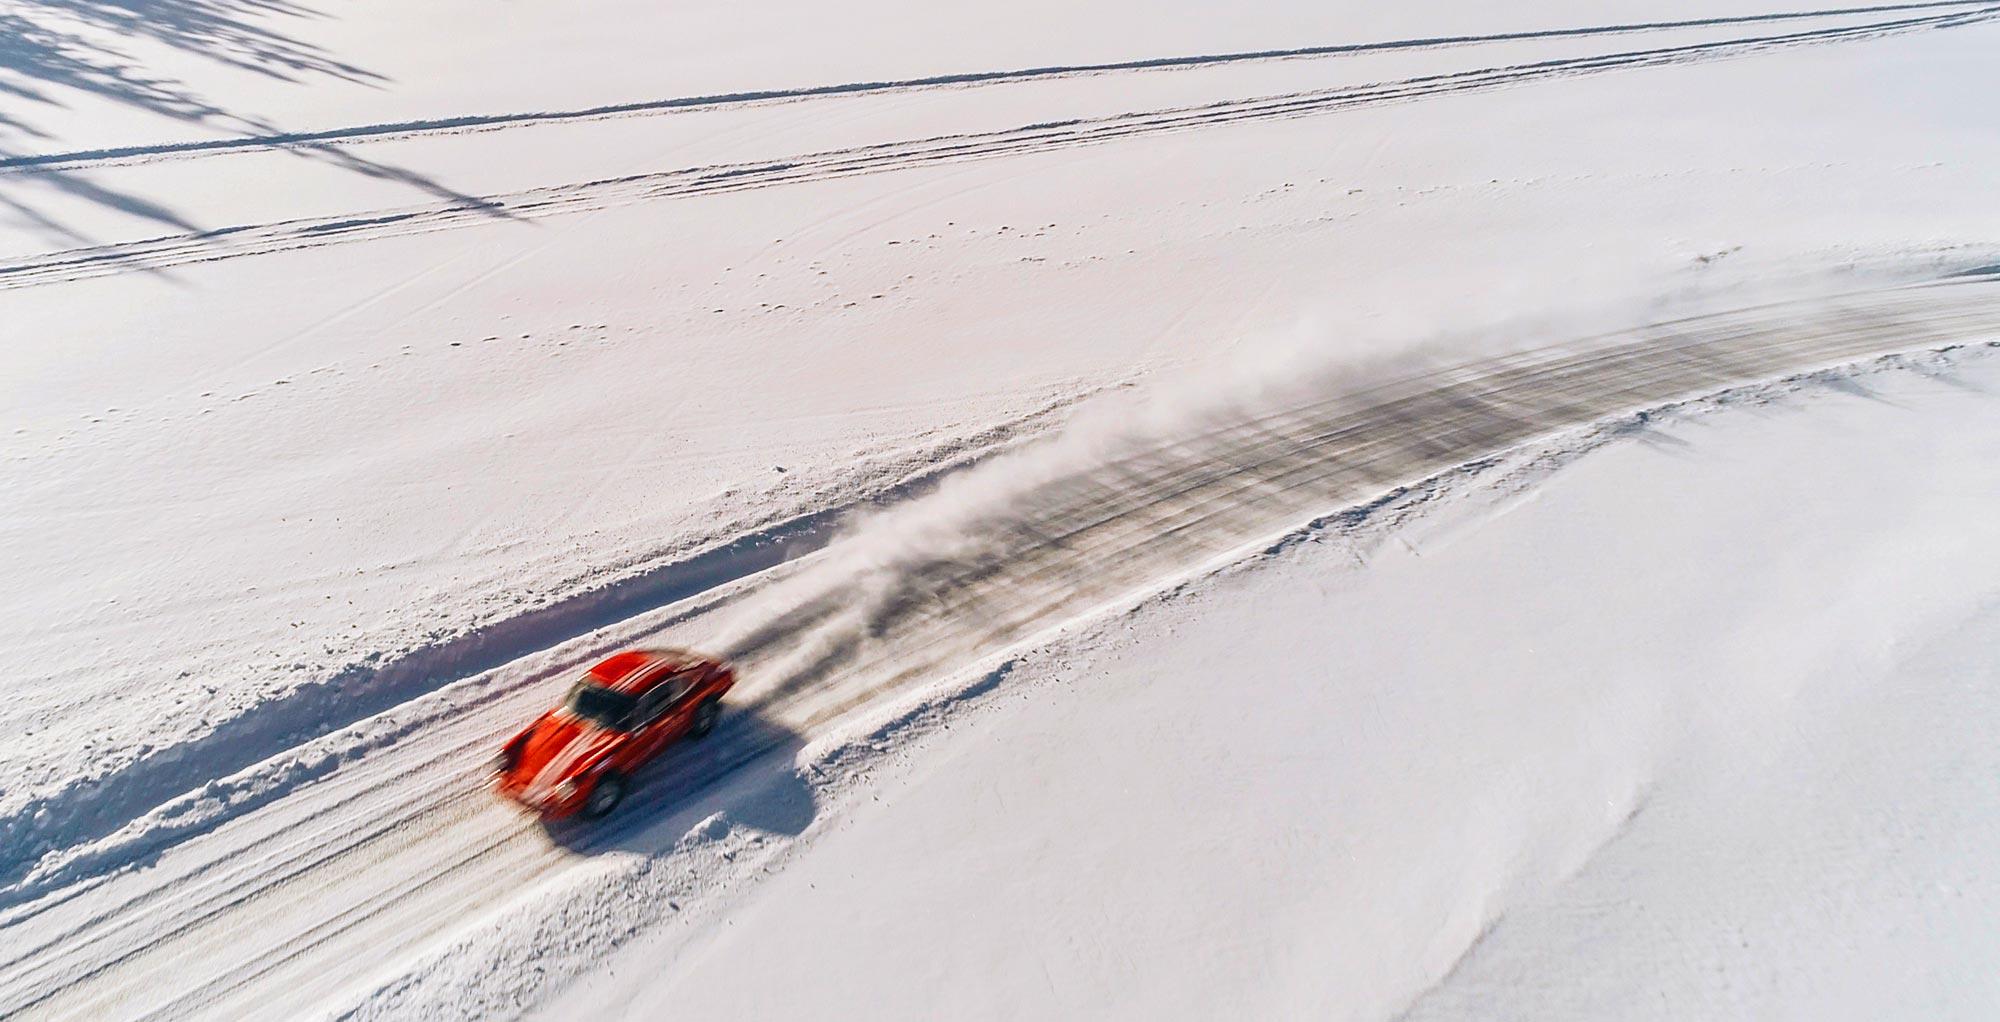 Porsche Ice Driving Sweden (mobile)